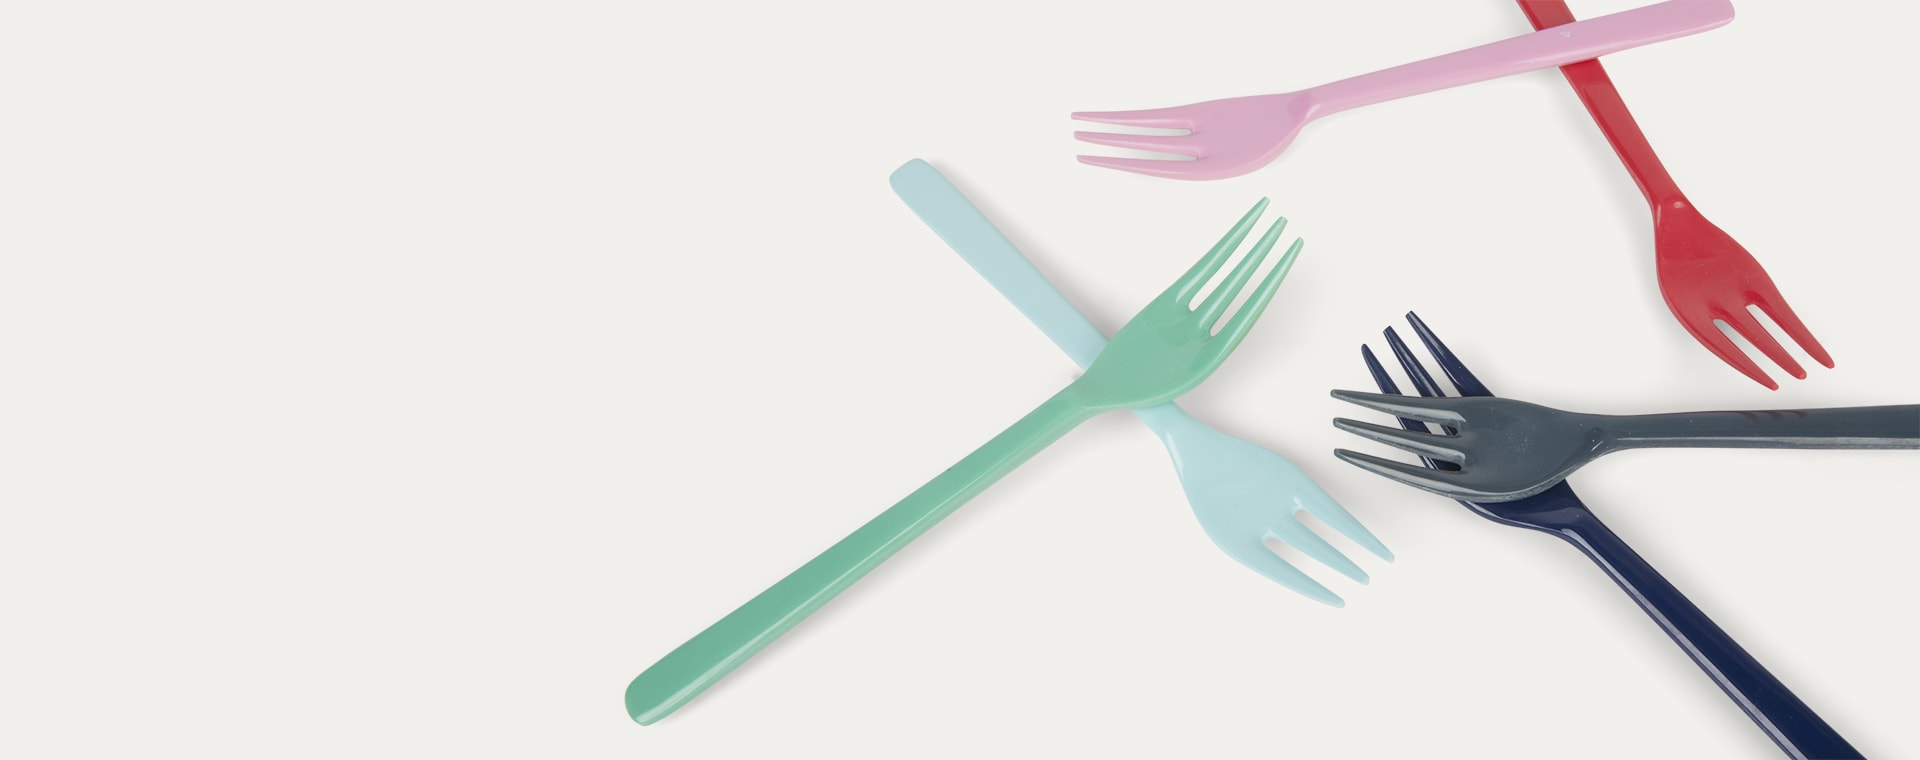 Lipstick Forks Rice Melamine Cutlery 6 Pack